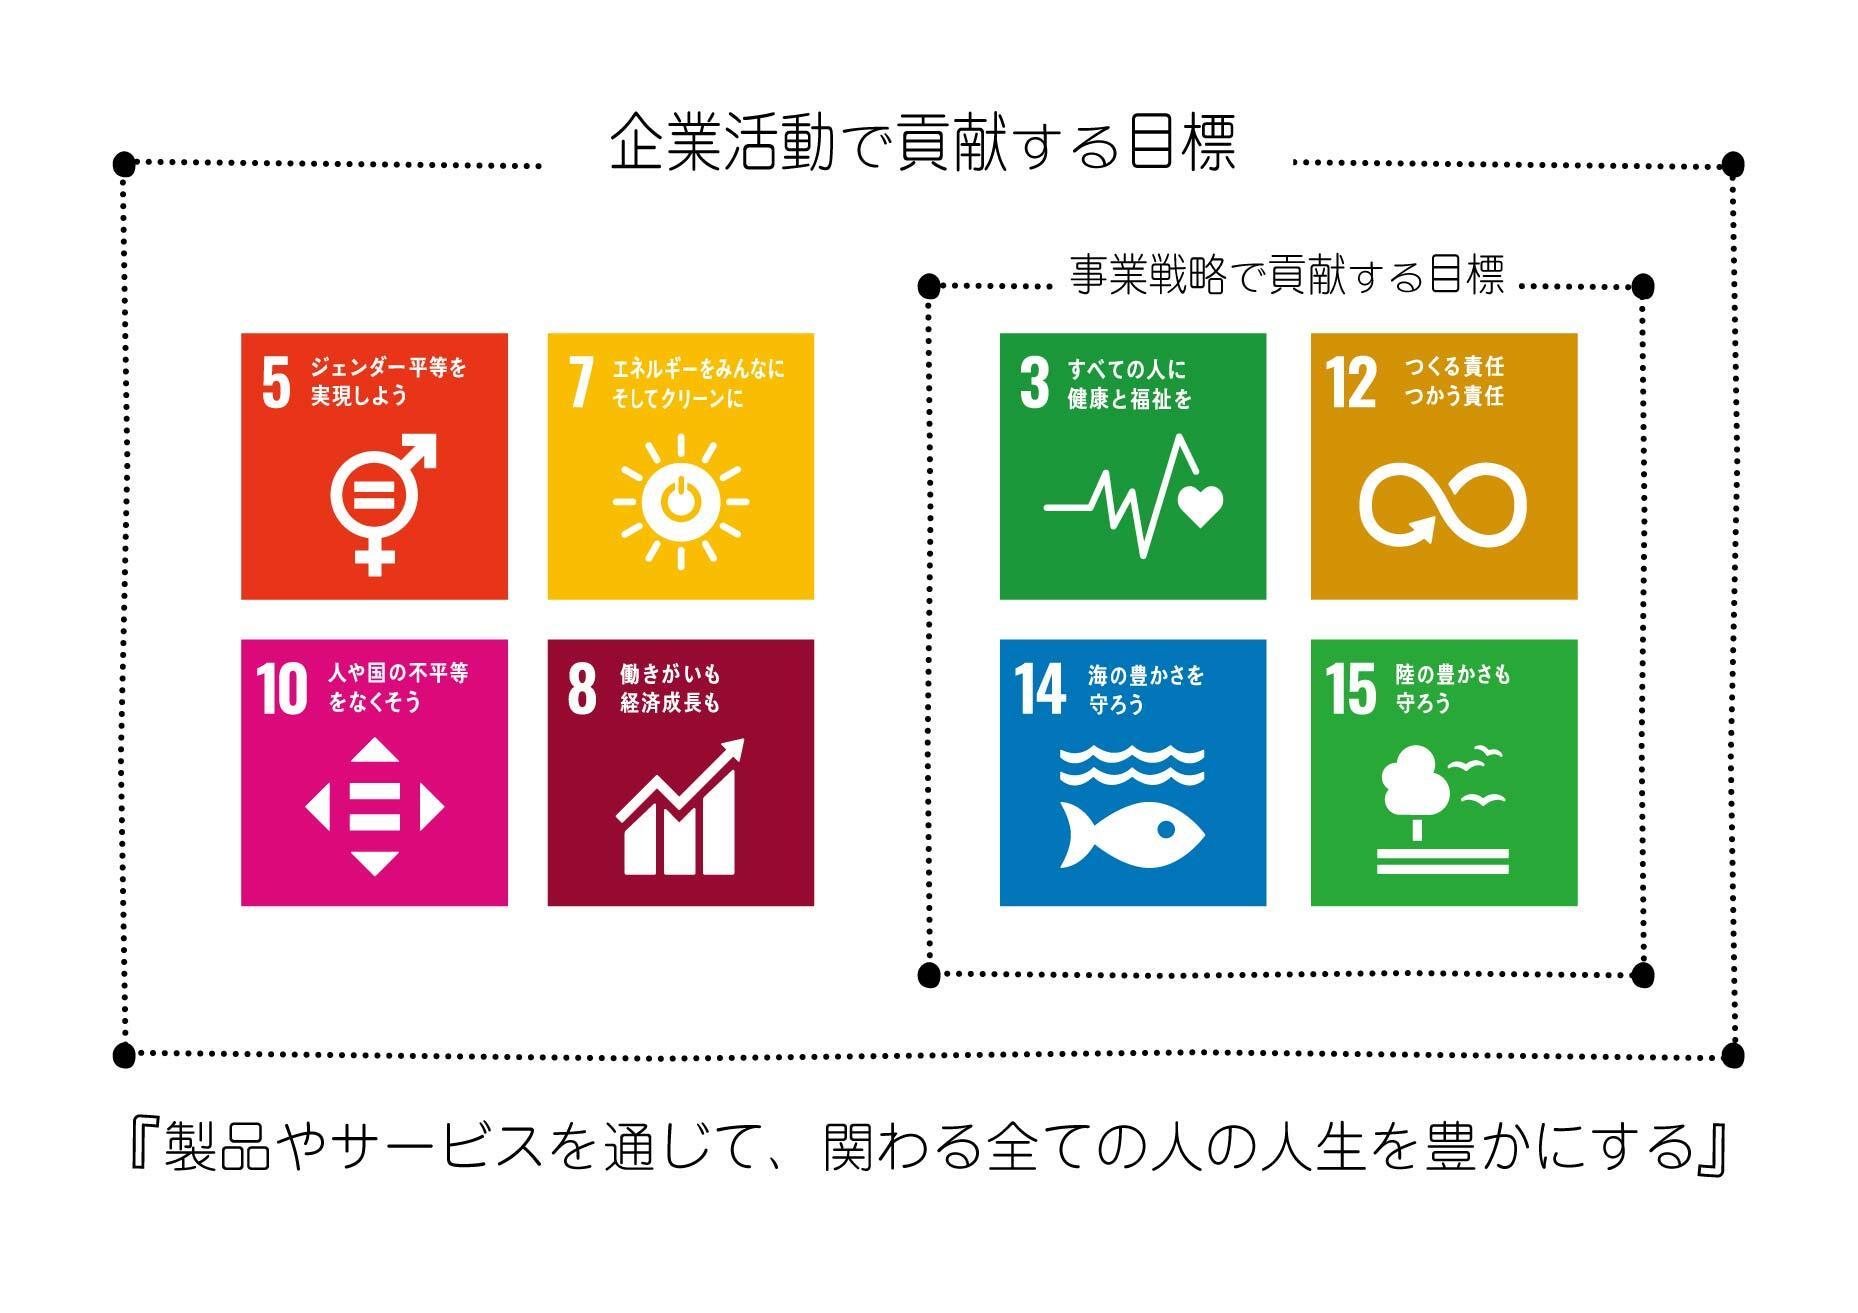 SDGs_メンバー似顔絵_マーク1200-630.jpg